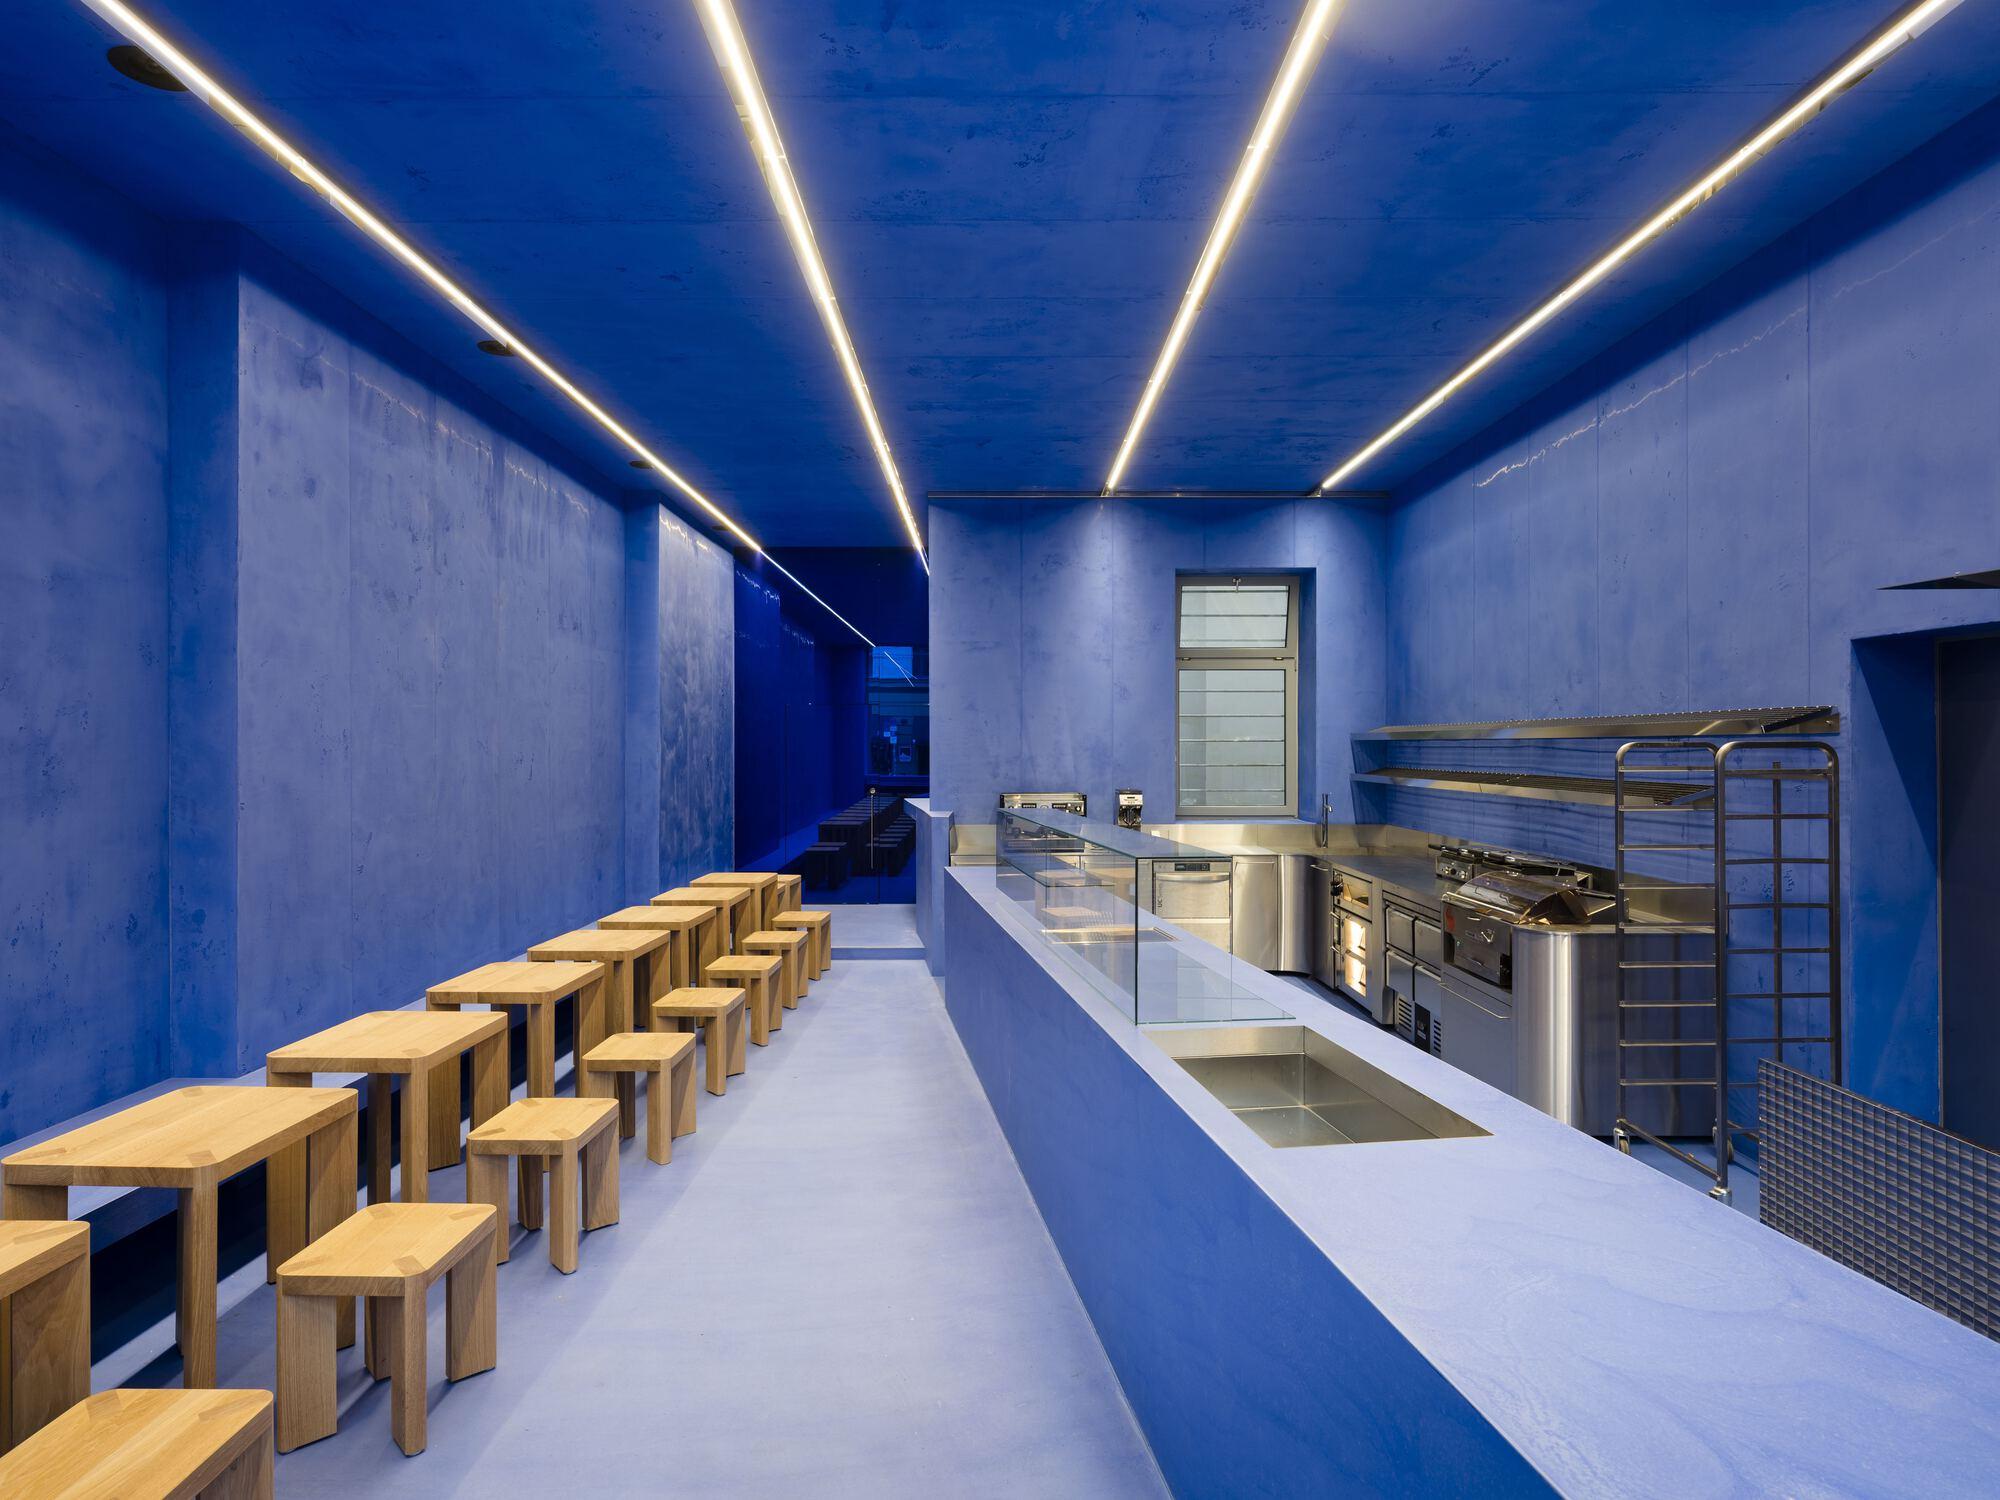 Aera Bakery / Gonzalez Haase Architects